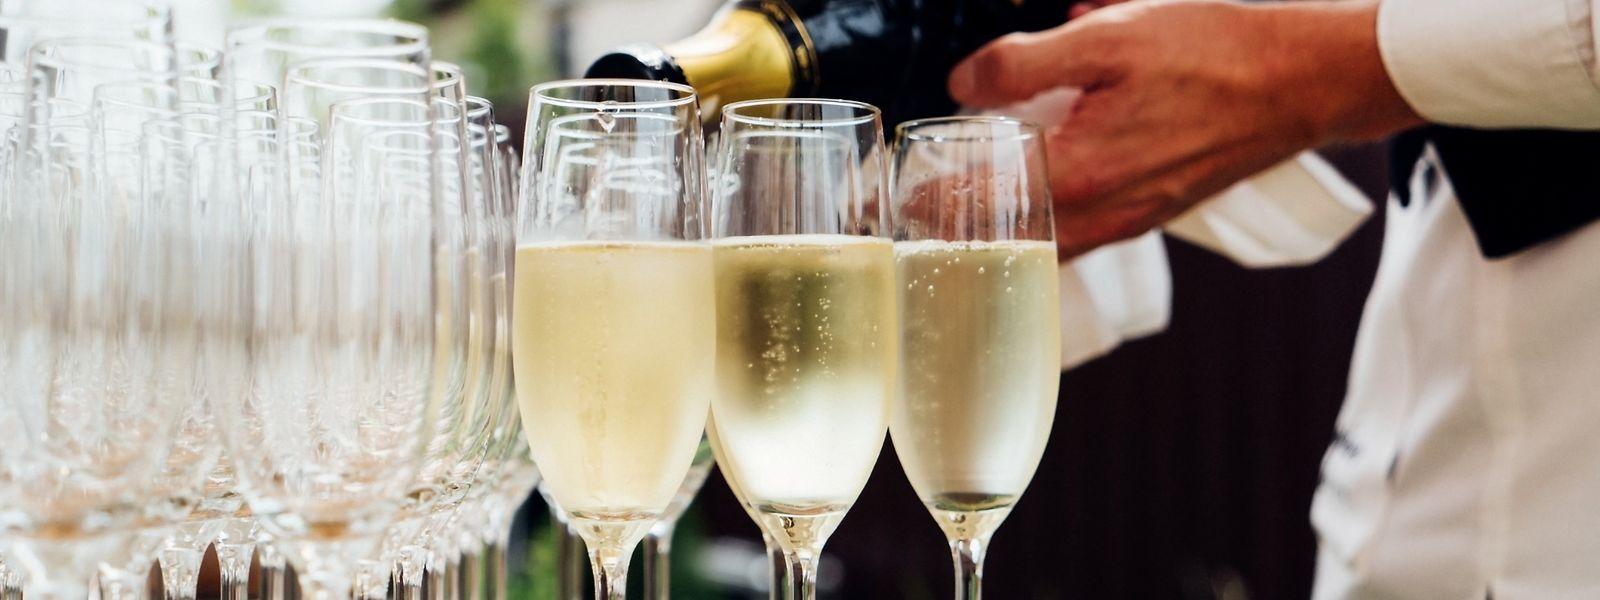 Champagner geht immer - fand zumindest Napoleon.